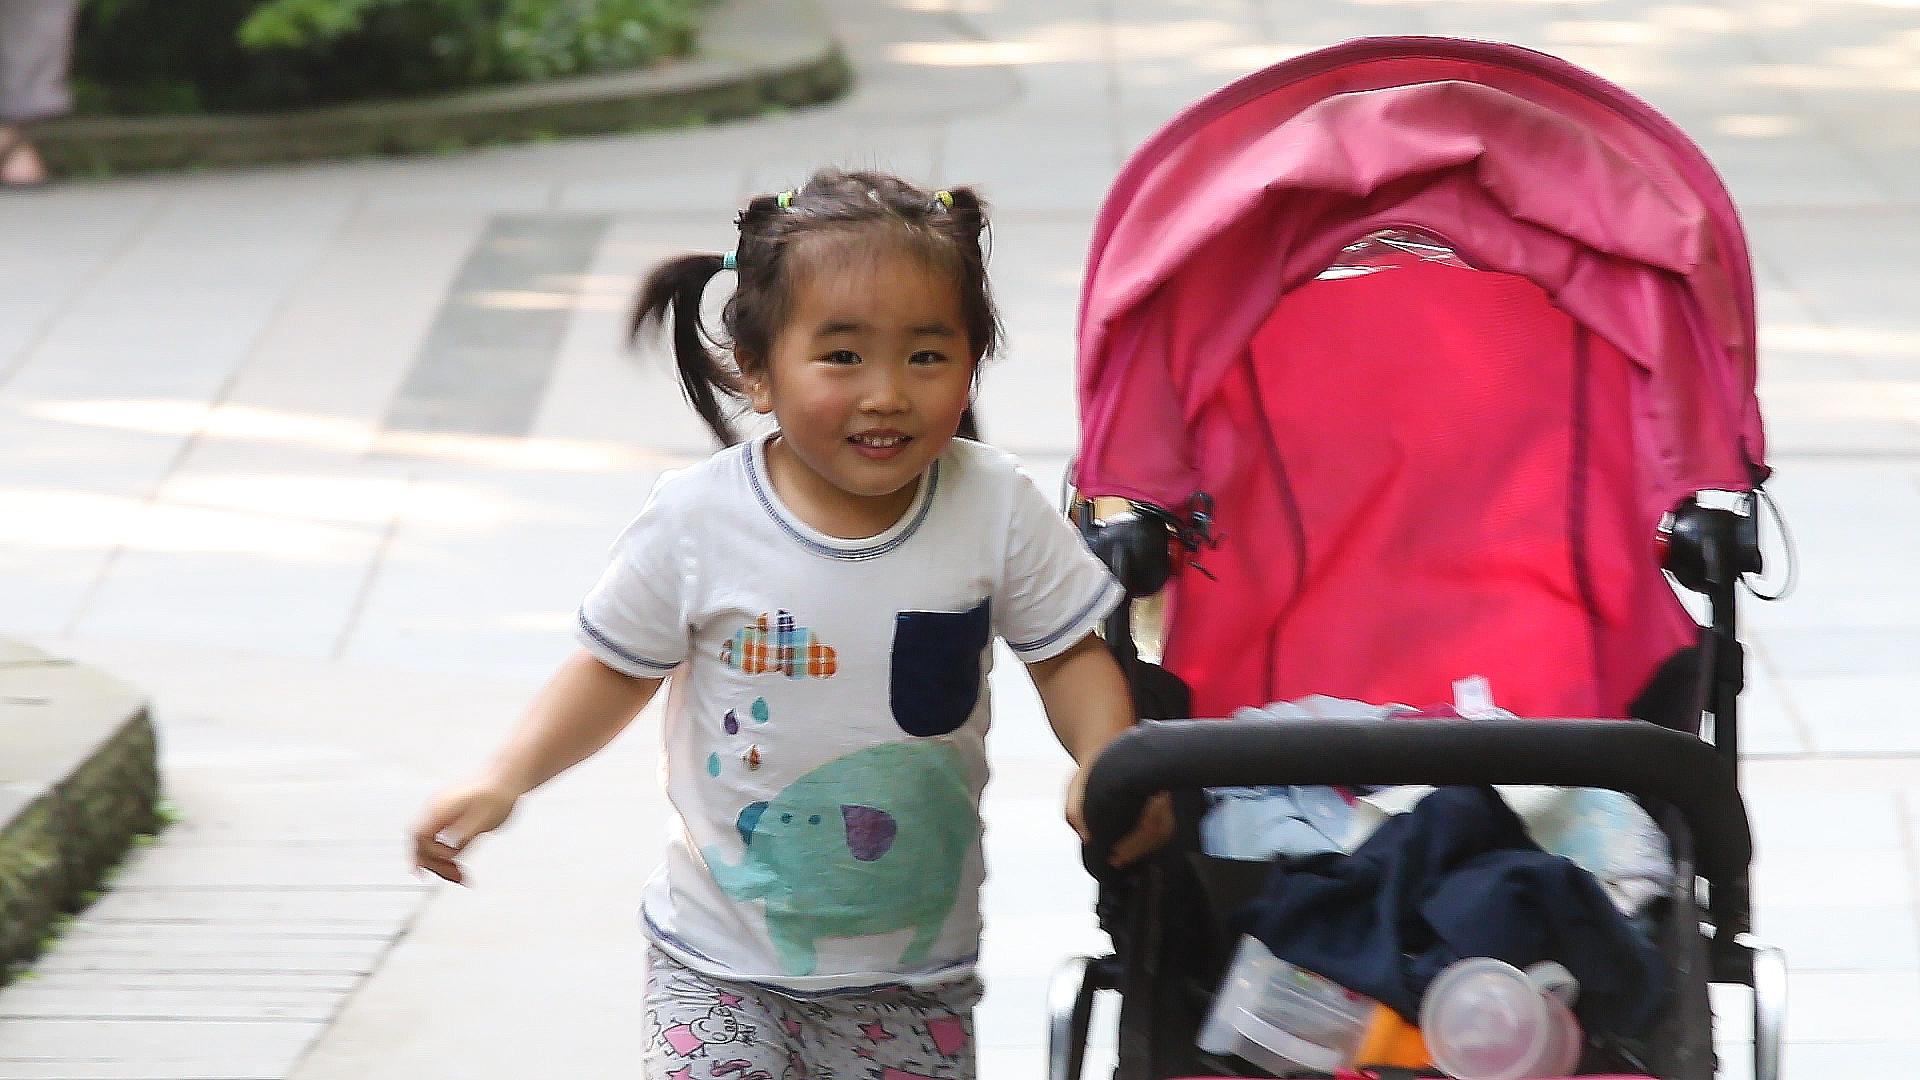 Chine, Pékin, parc Beihai, fille chinoise